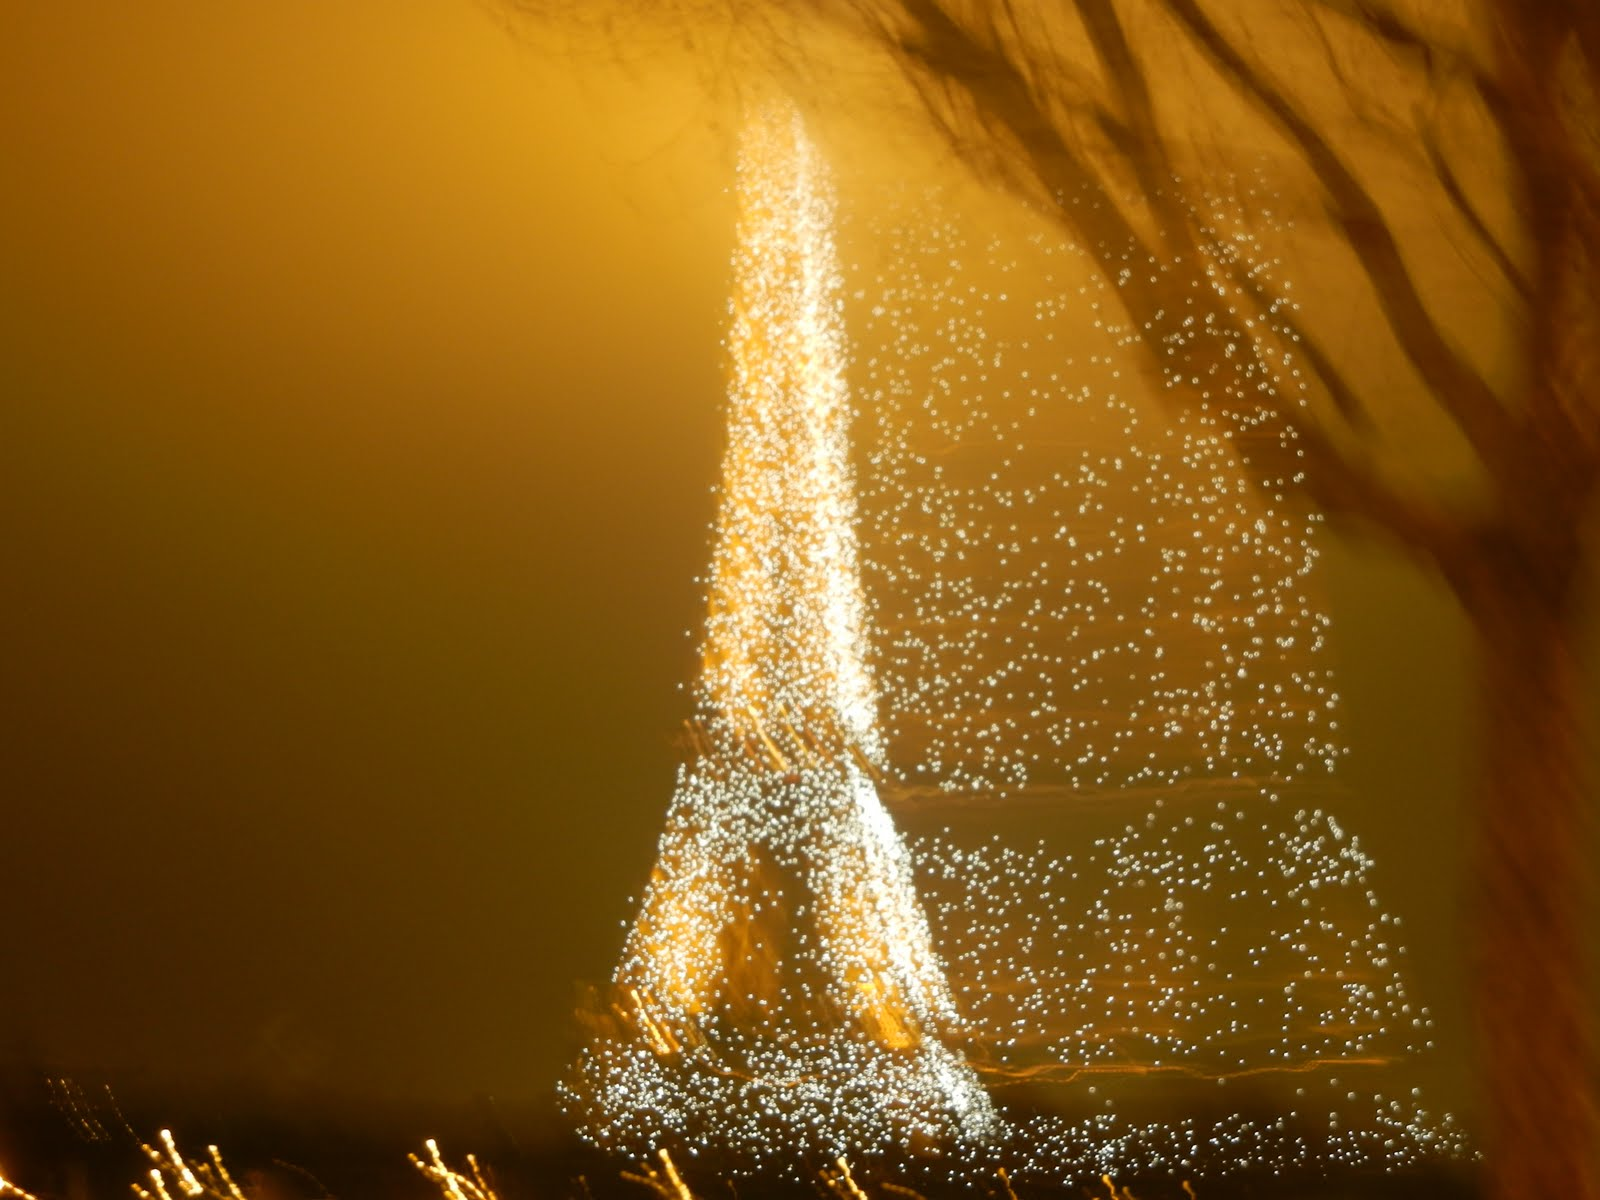 My most favorite unintentional blurry photo - Paris NYE 2011